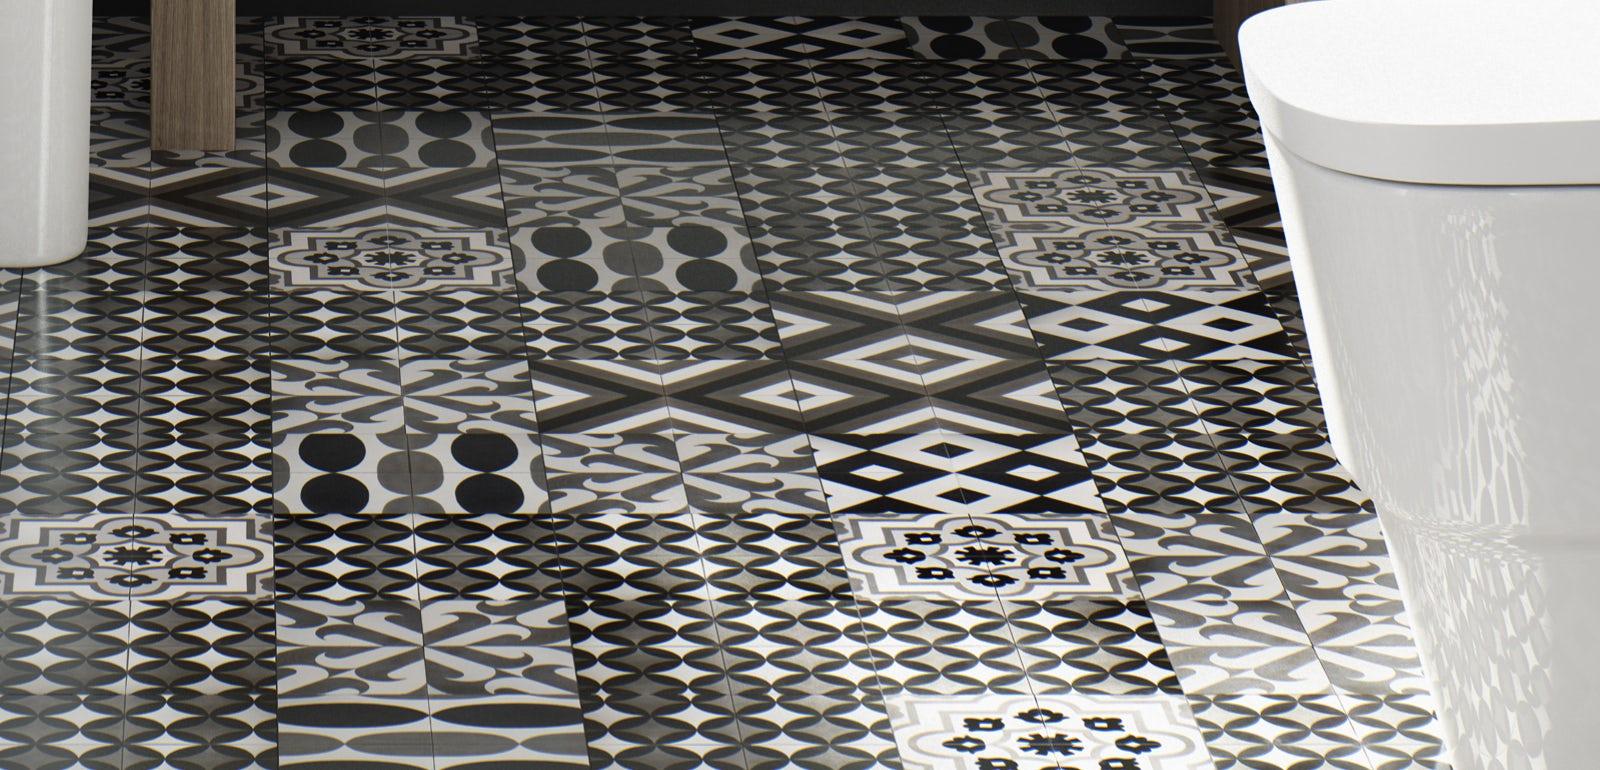 style art deco bathroom on a budget victoriaplum com rh victoriaplum com Vintage Floor Tile Patterns Vintage Floor Tile Patterns